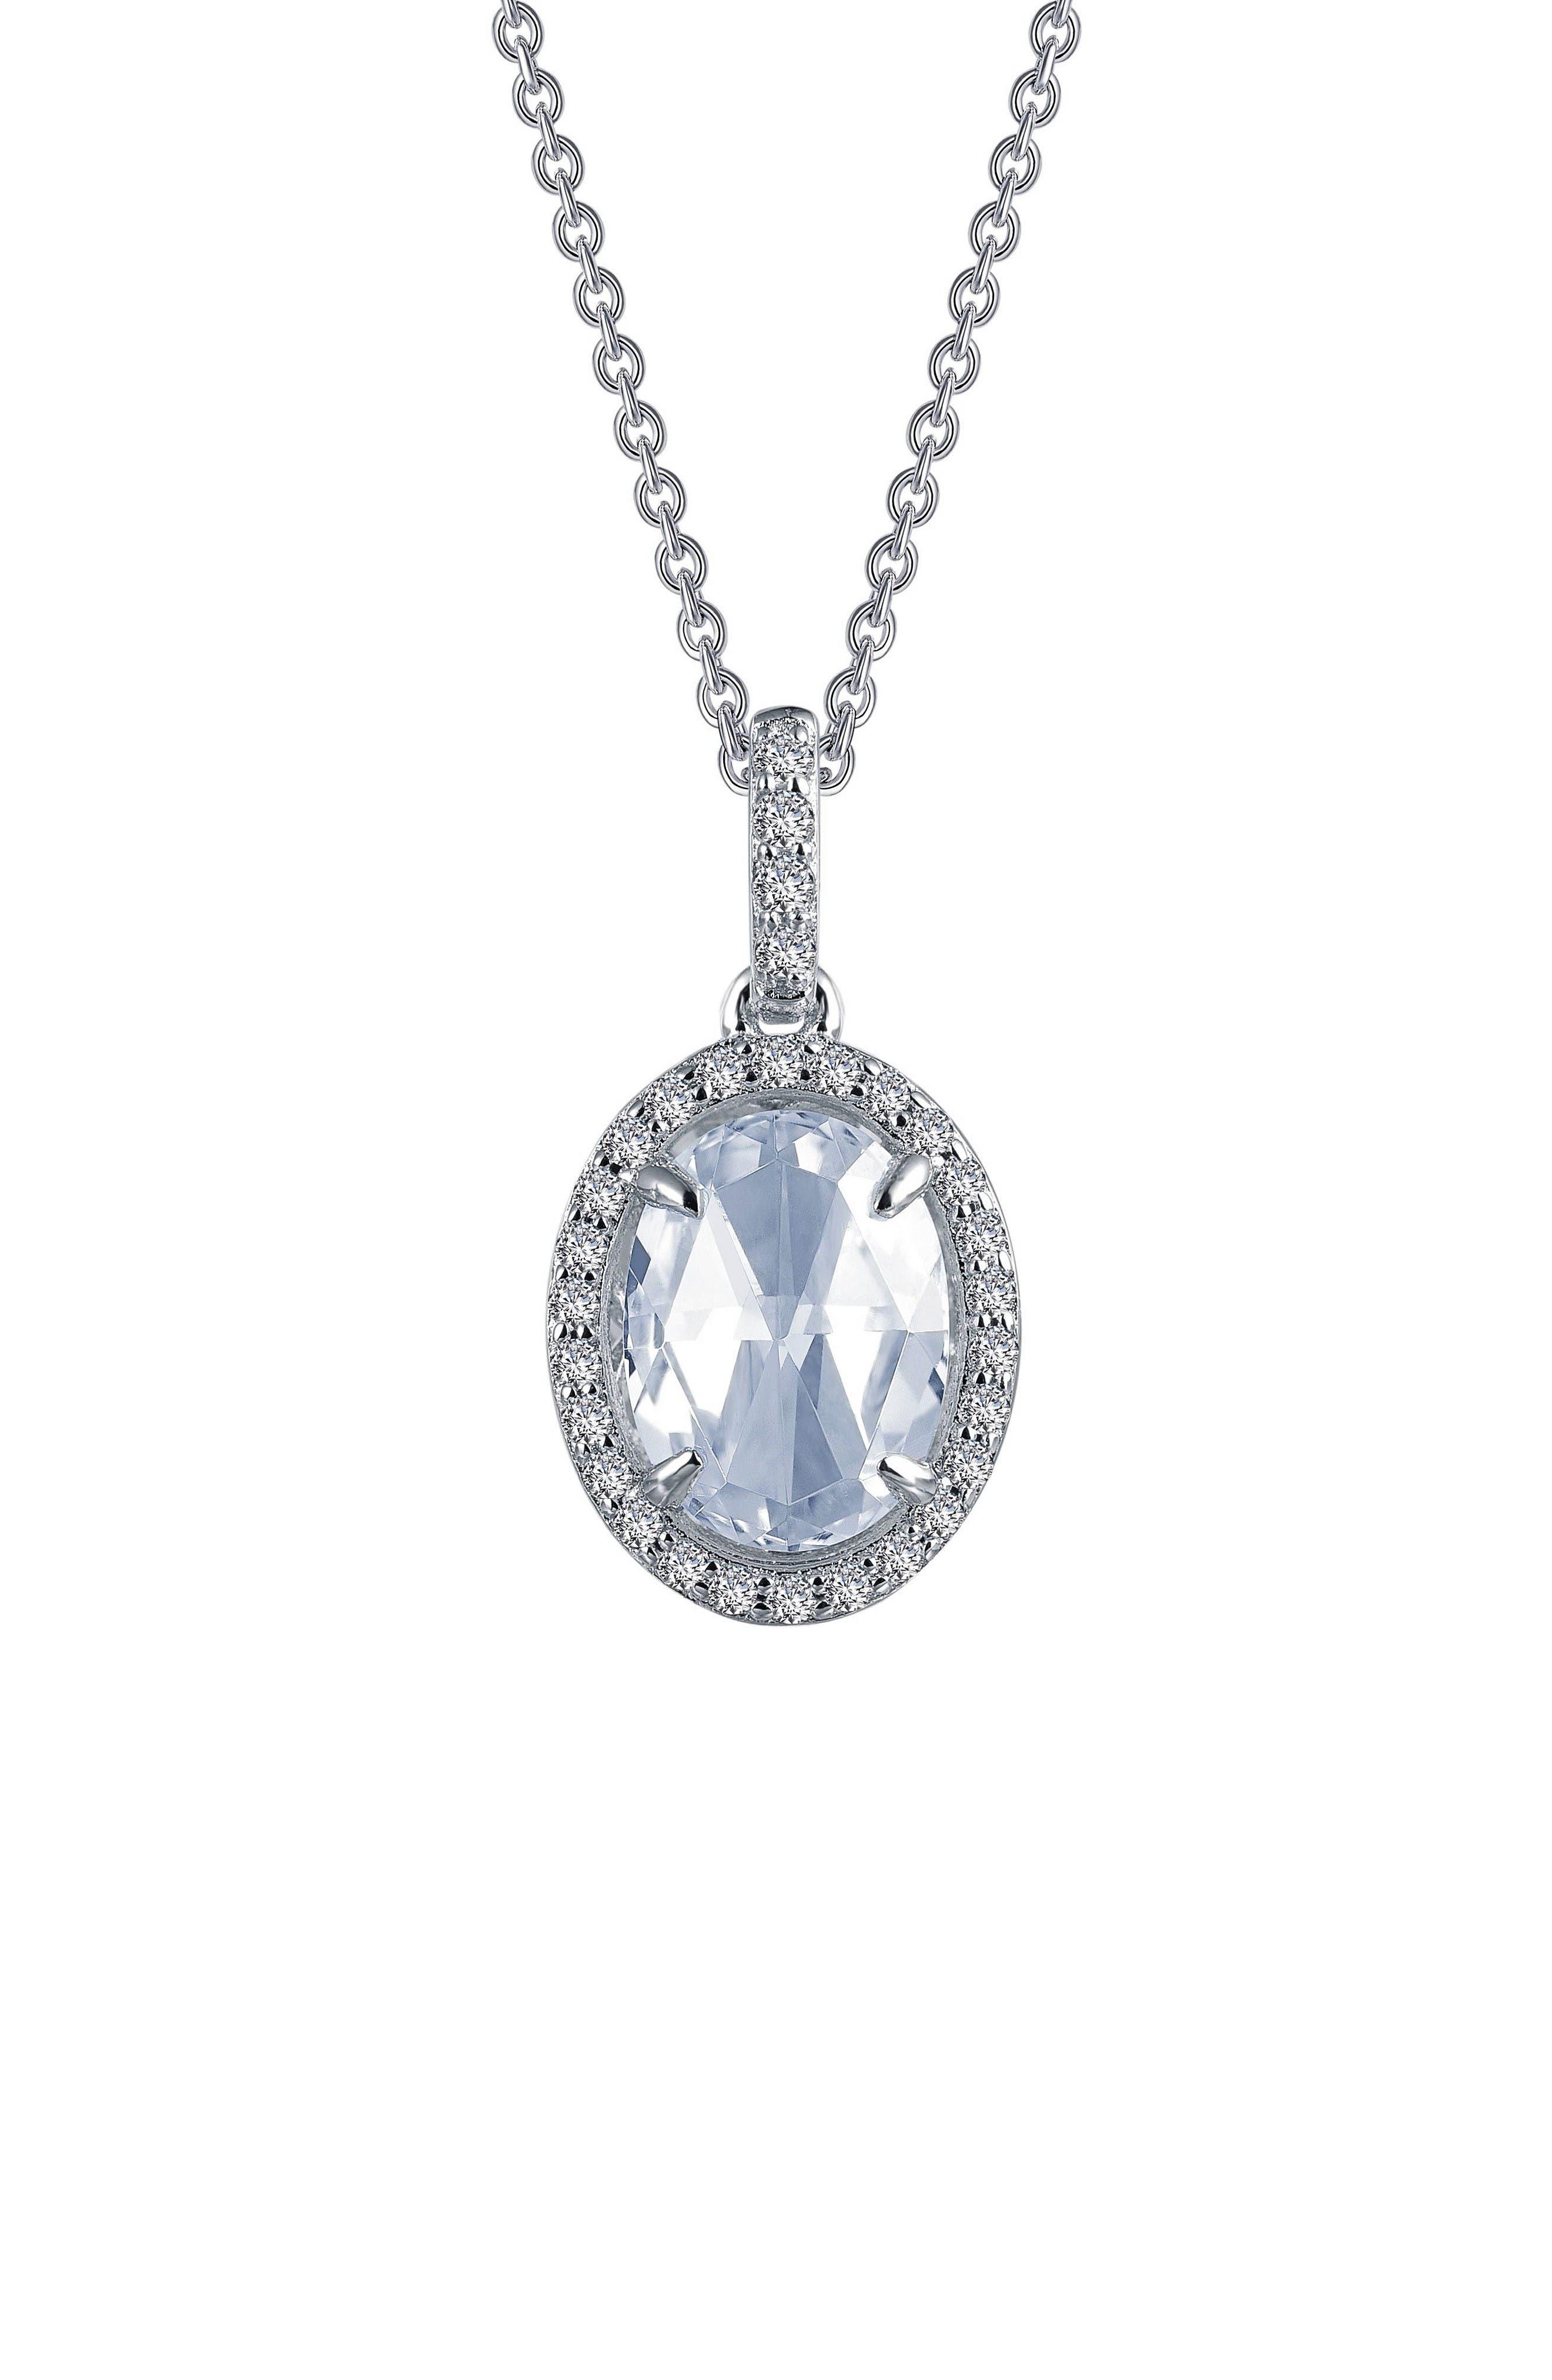 LAFONN Rose Cut Simulated Diamond Pendant Necklace